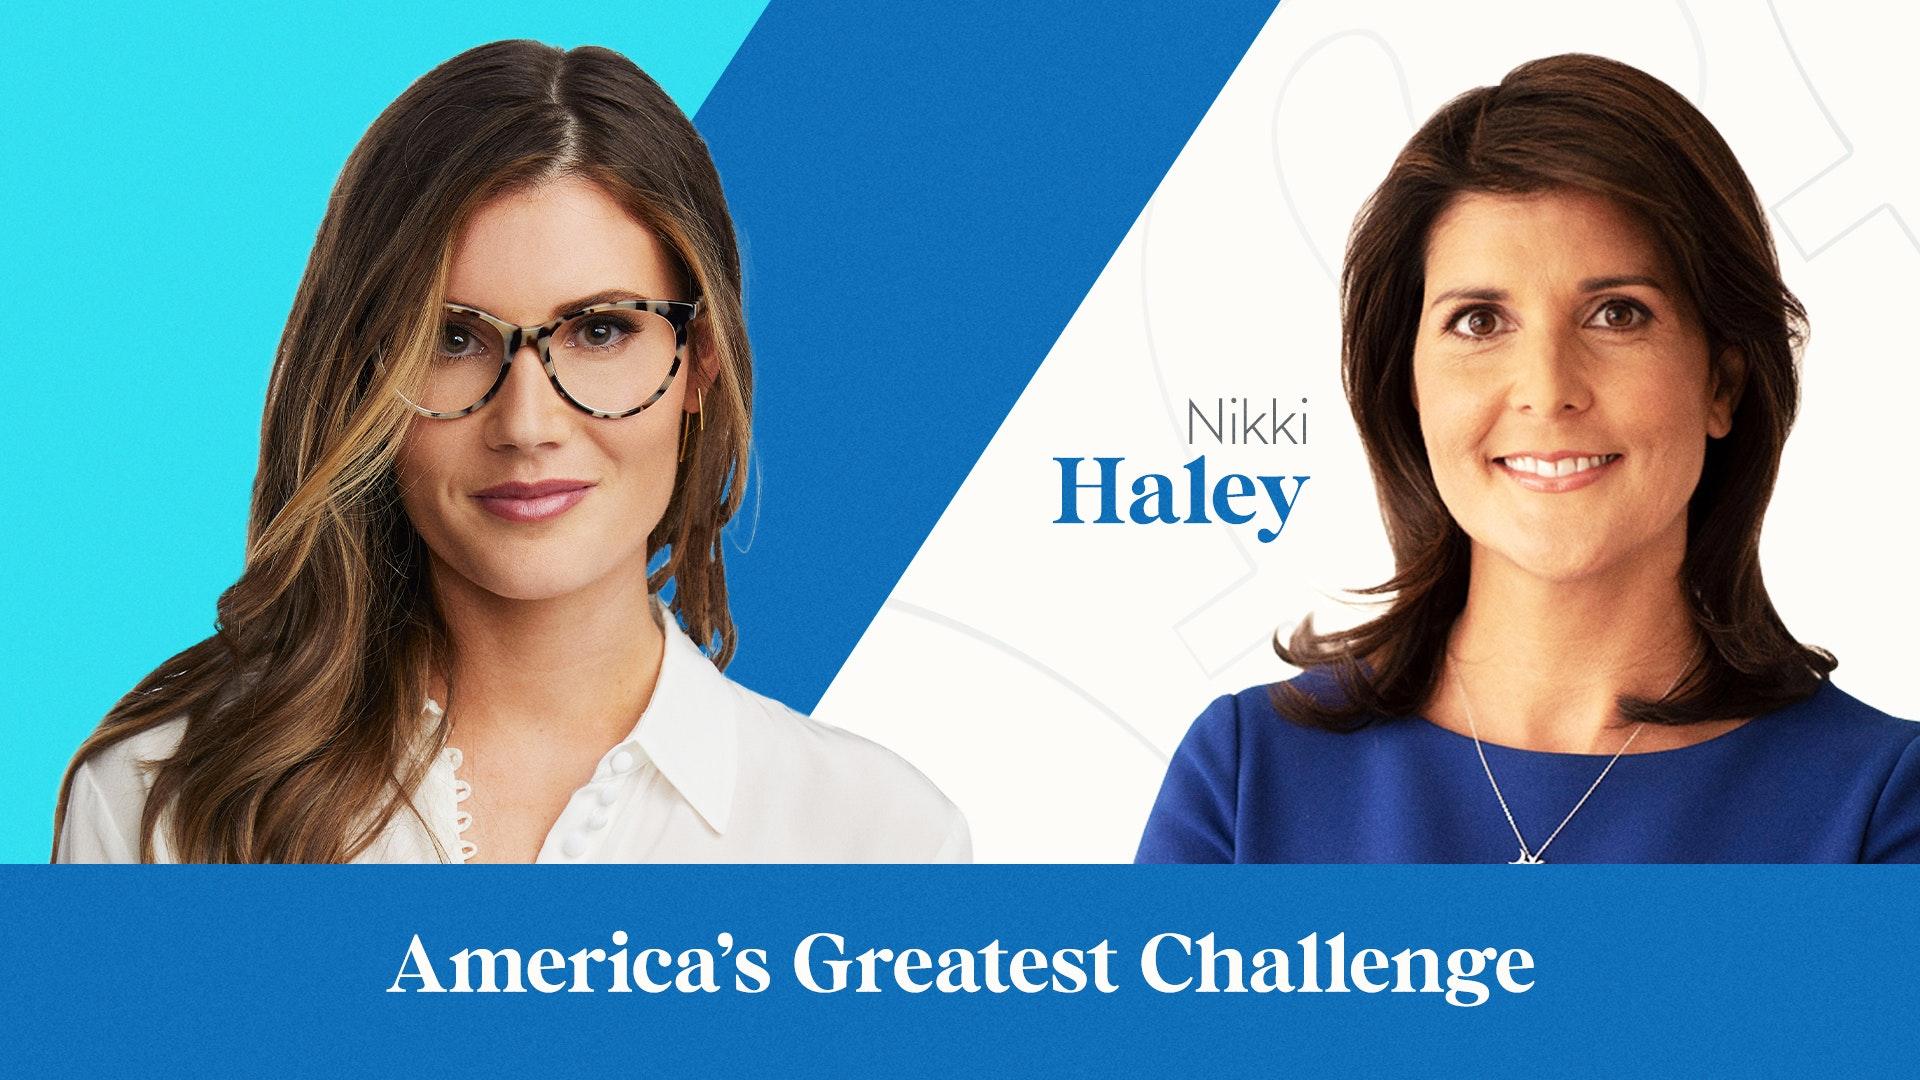 America's Greatest Challenge